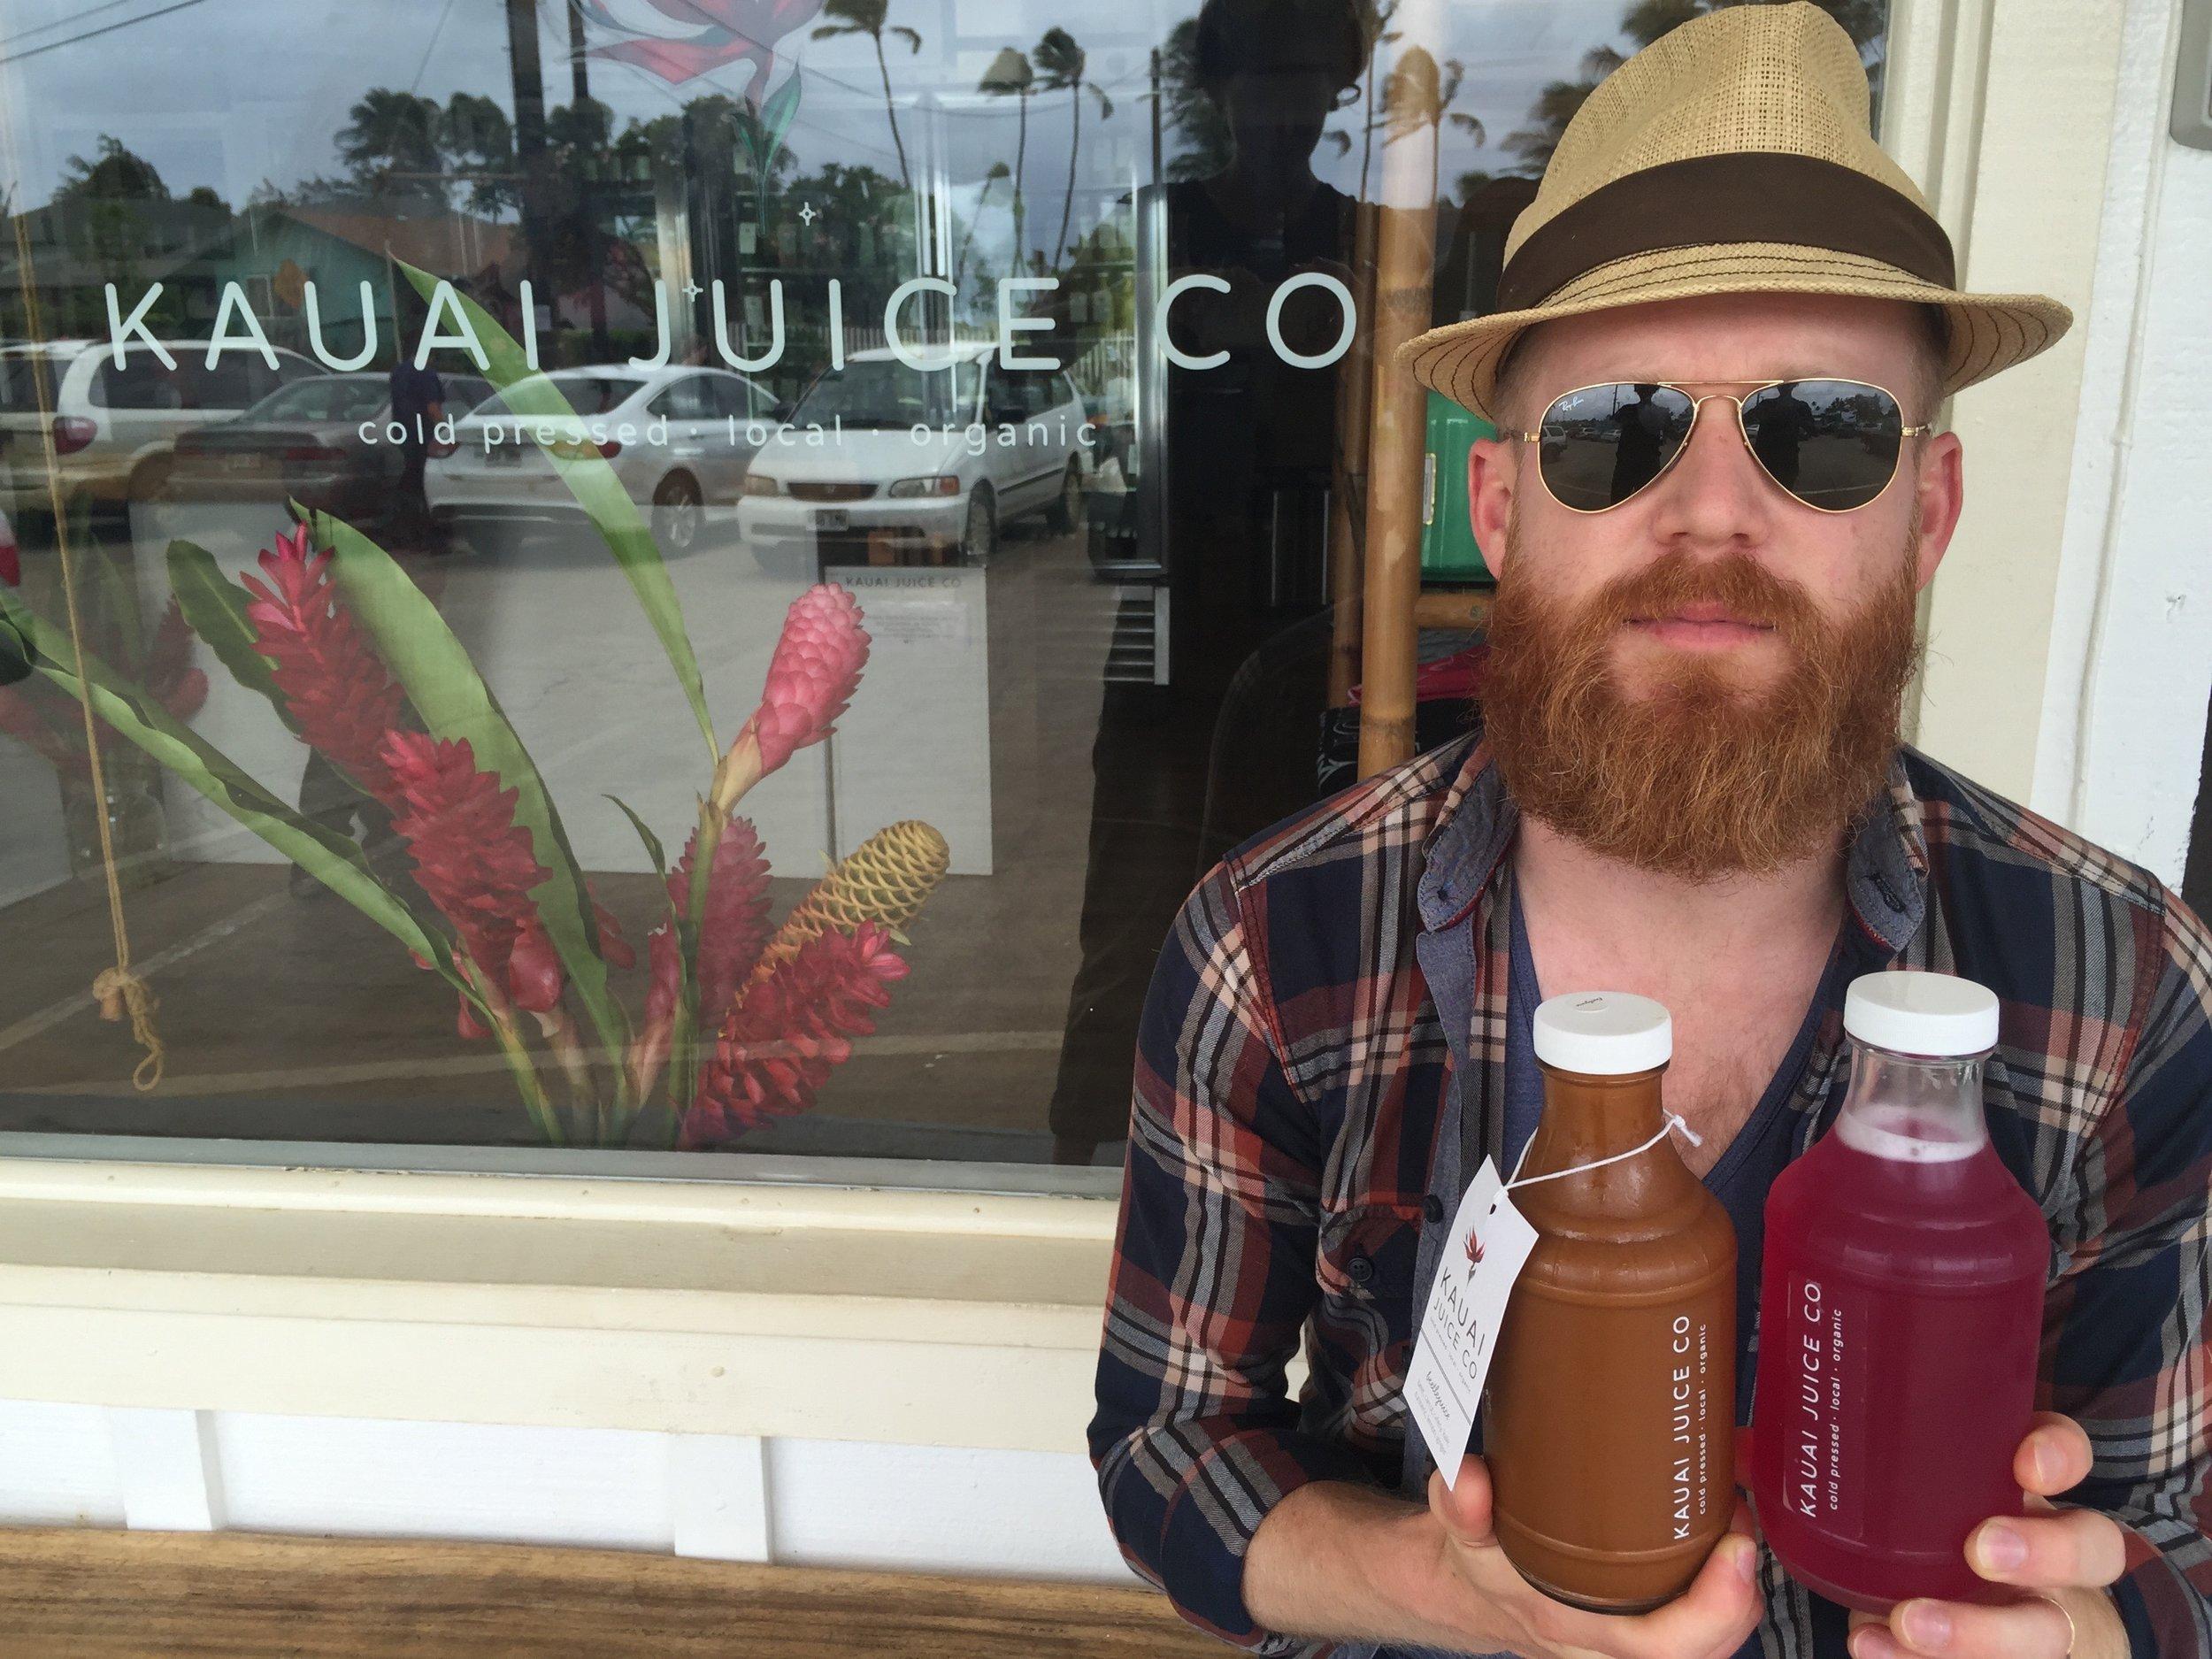 The husband at Kauai Juice Co with a 'Beetlejuice' and a pineapple/dragonfruit kombucha.